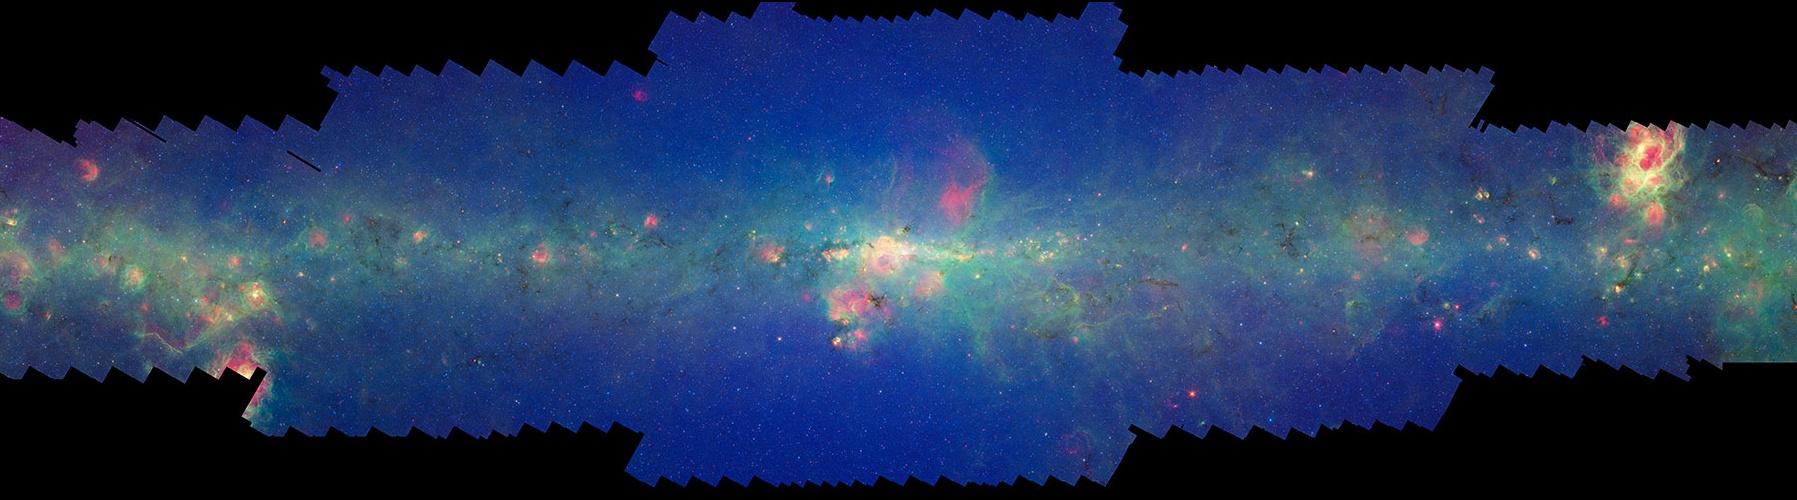 Apod 2008 June 5 Spitzer S Milky Way